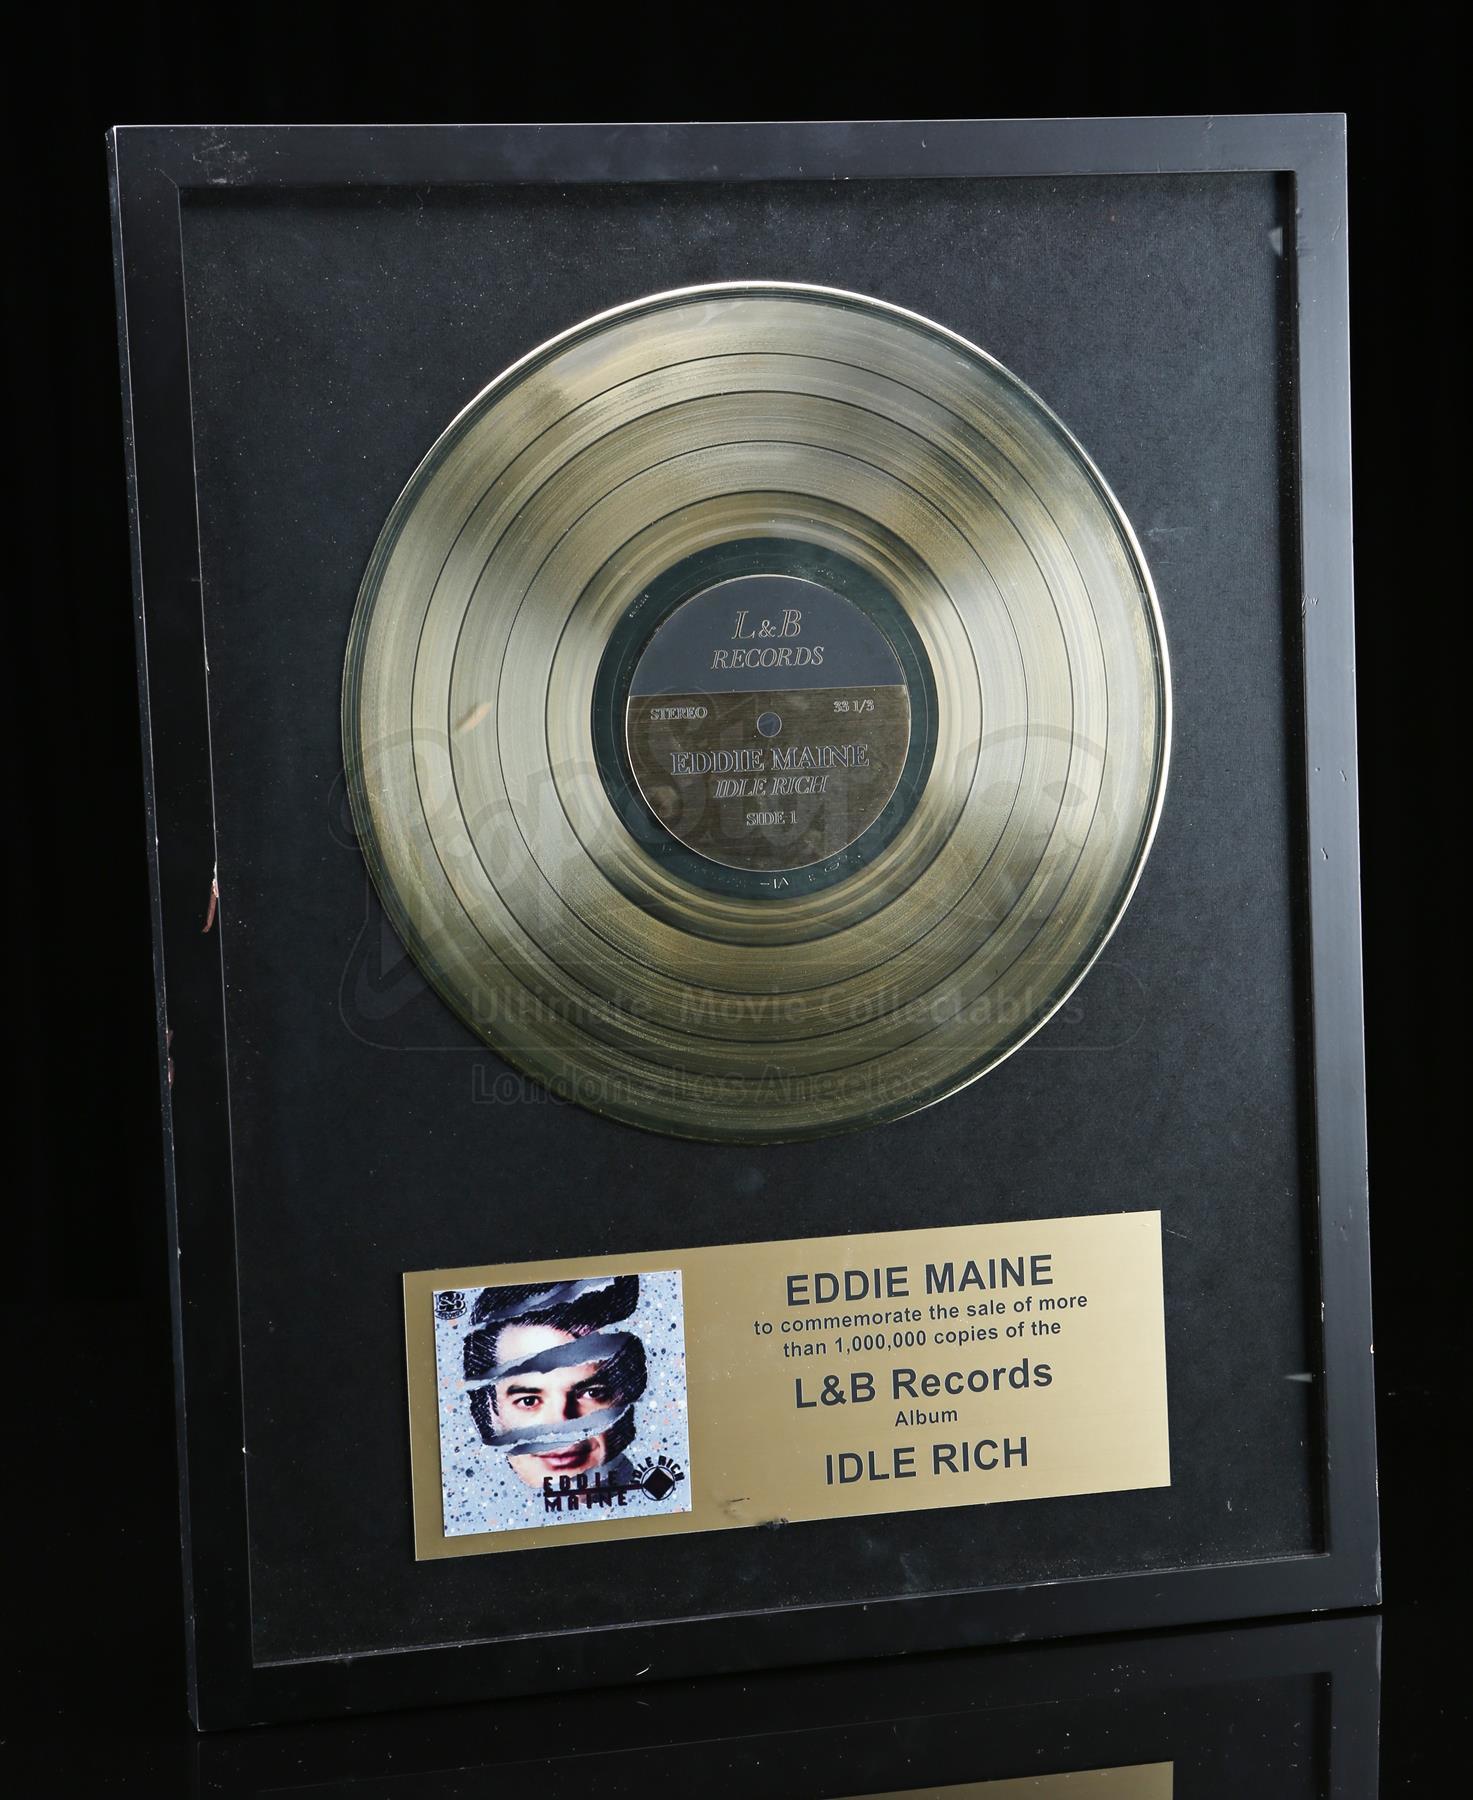 L&B Records